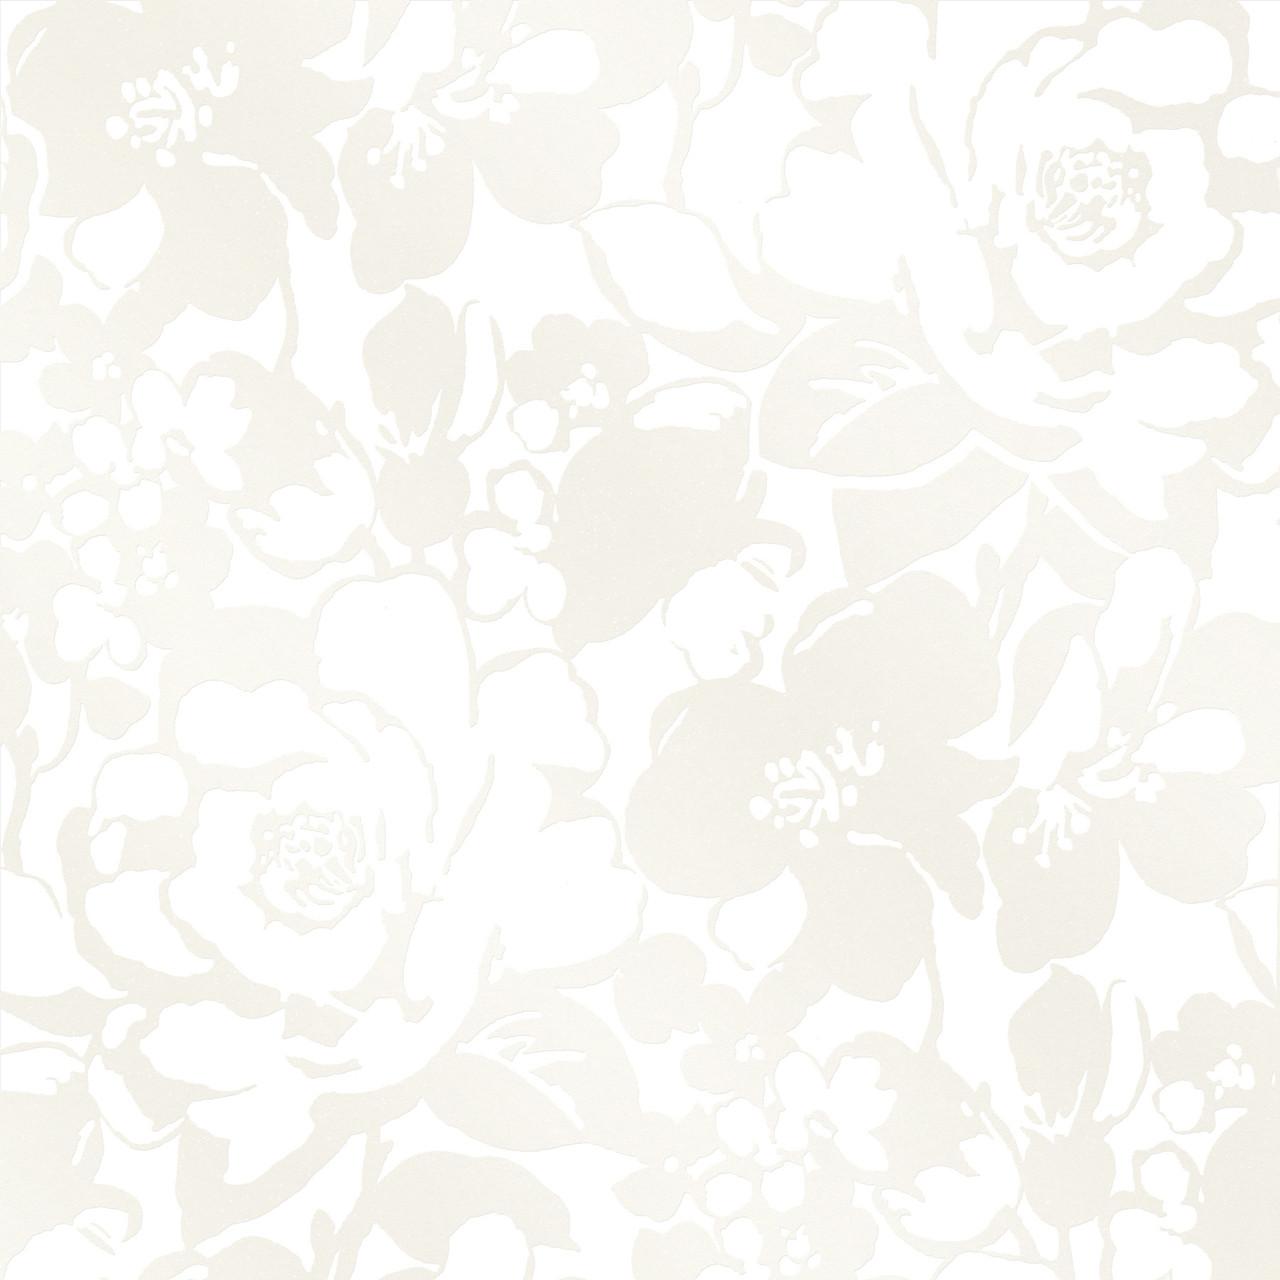 356000 Eccentricity White Damask Wallpaper Indoorwallpaper Com